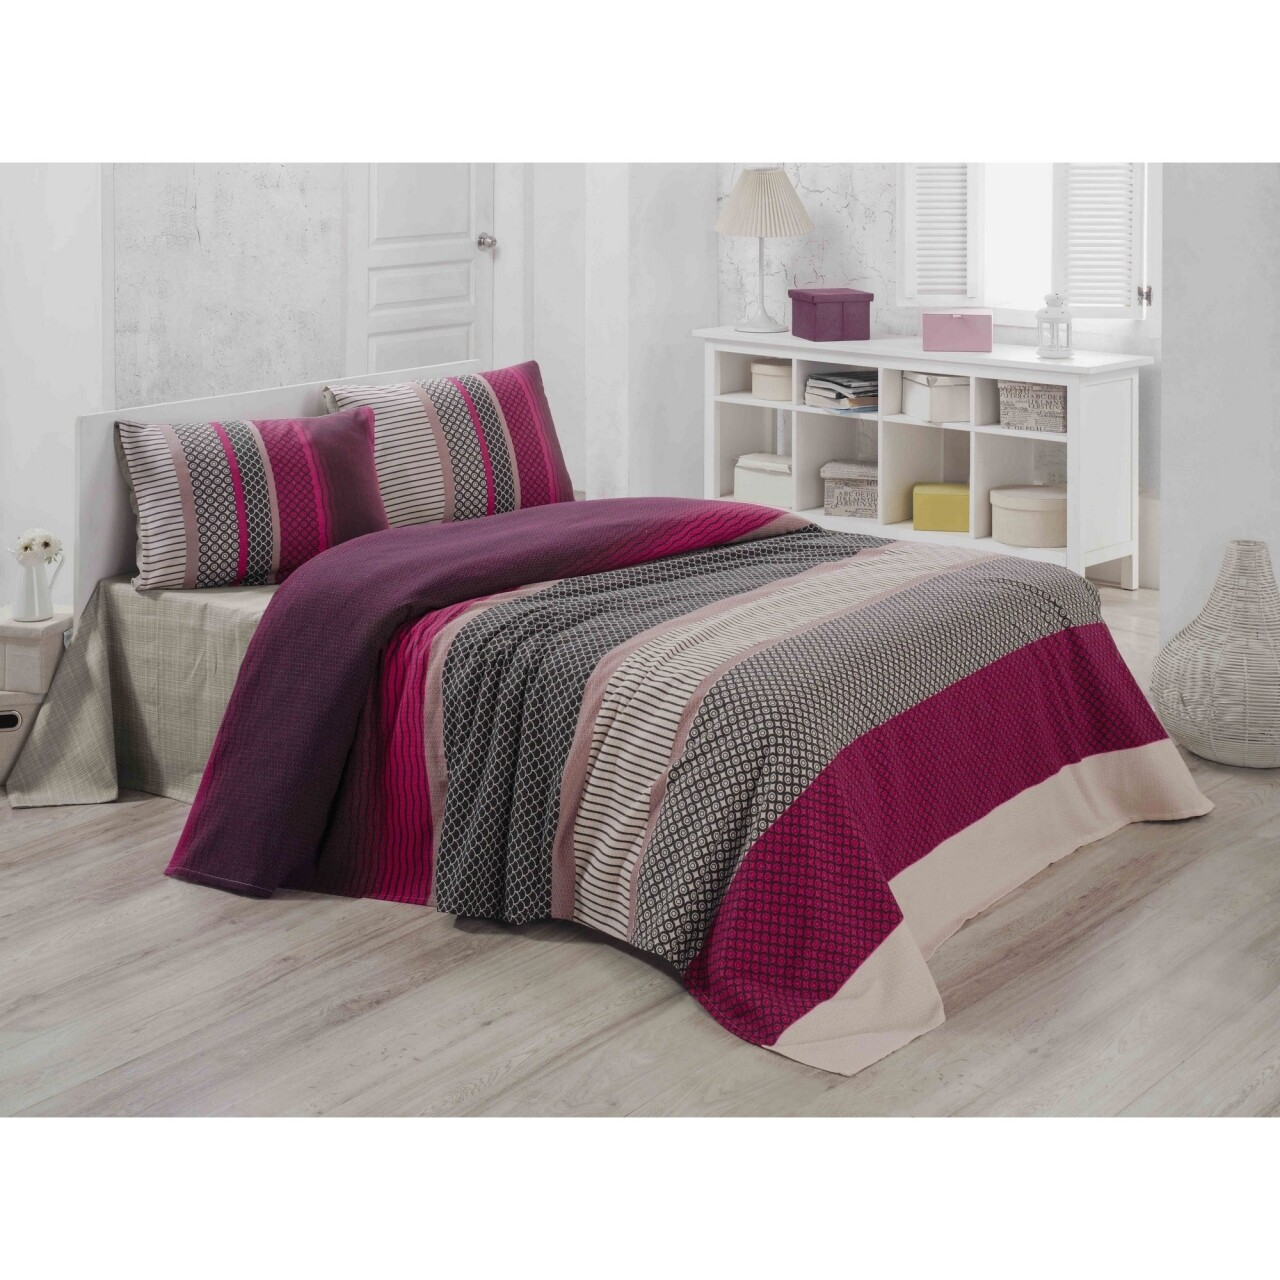 Cuvertura de pat, Victoria, Lotus Pique, 200x230 cm, 100% bumbac, multicolor